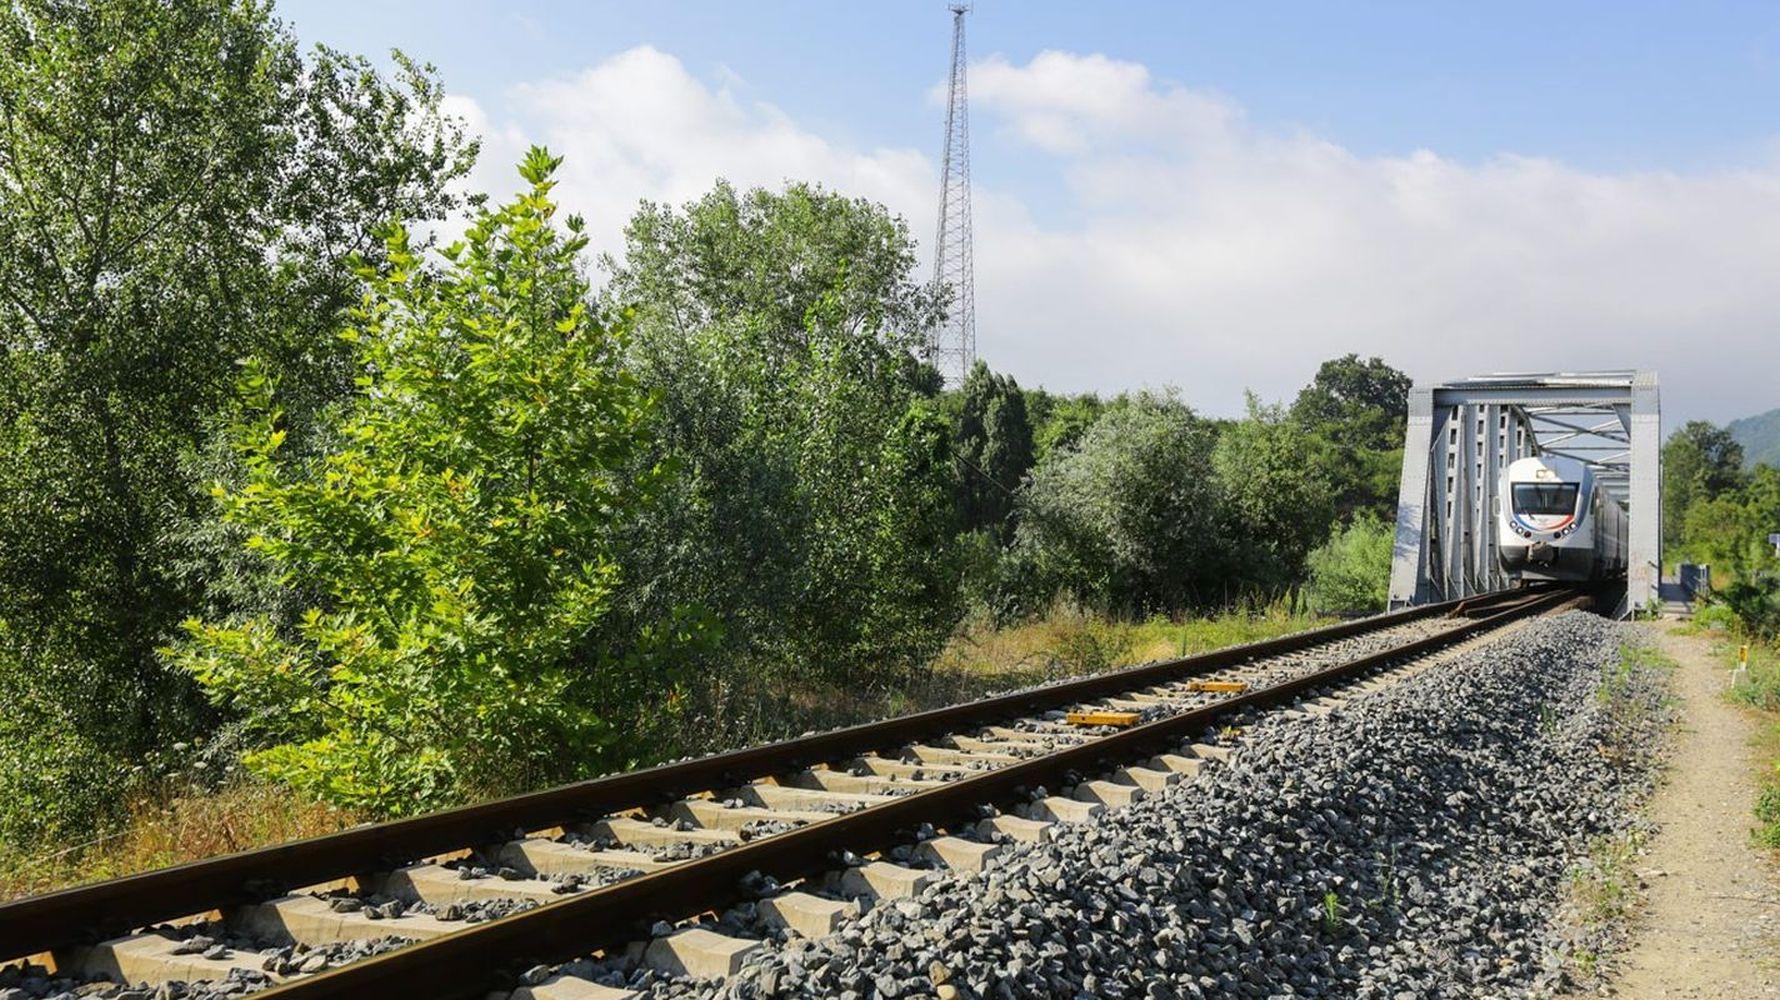 Irmak Cankiri line